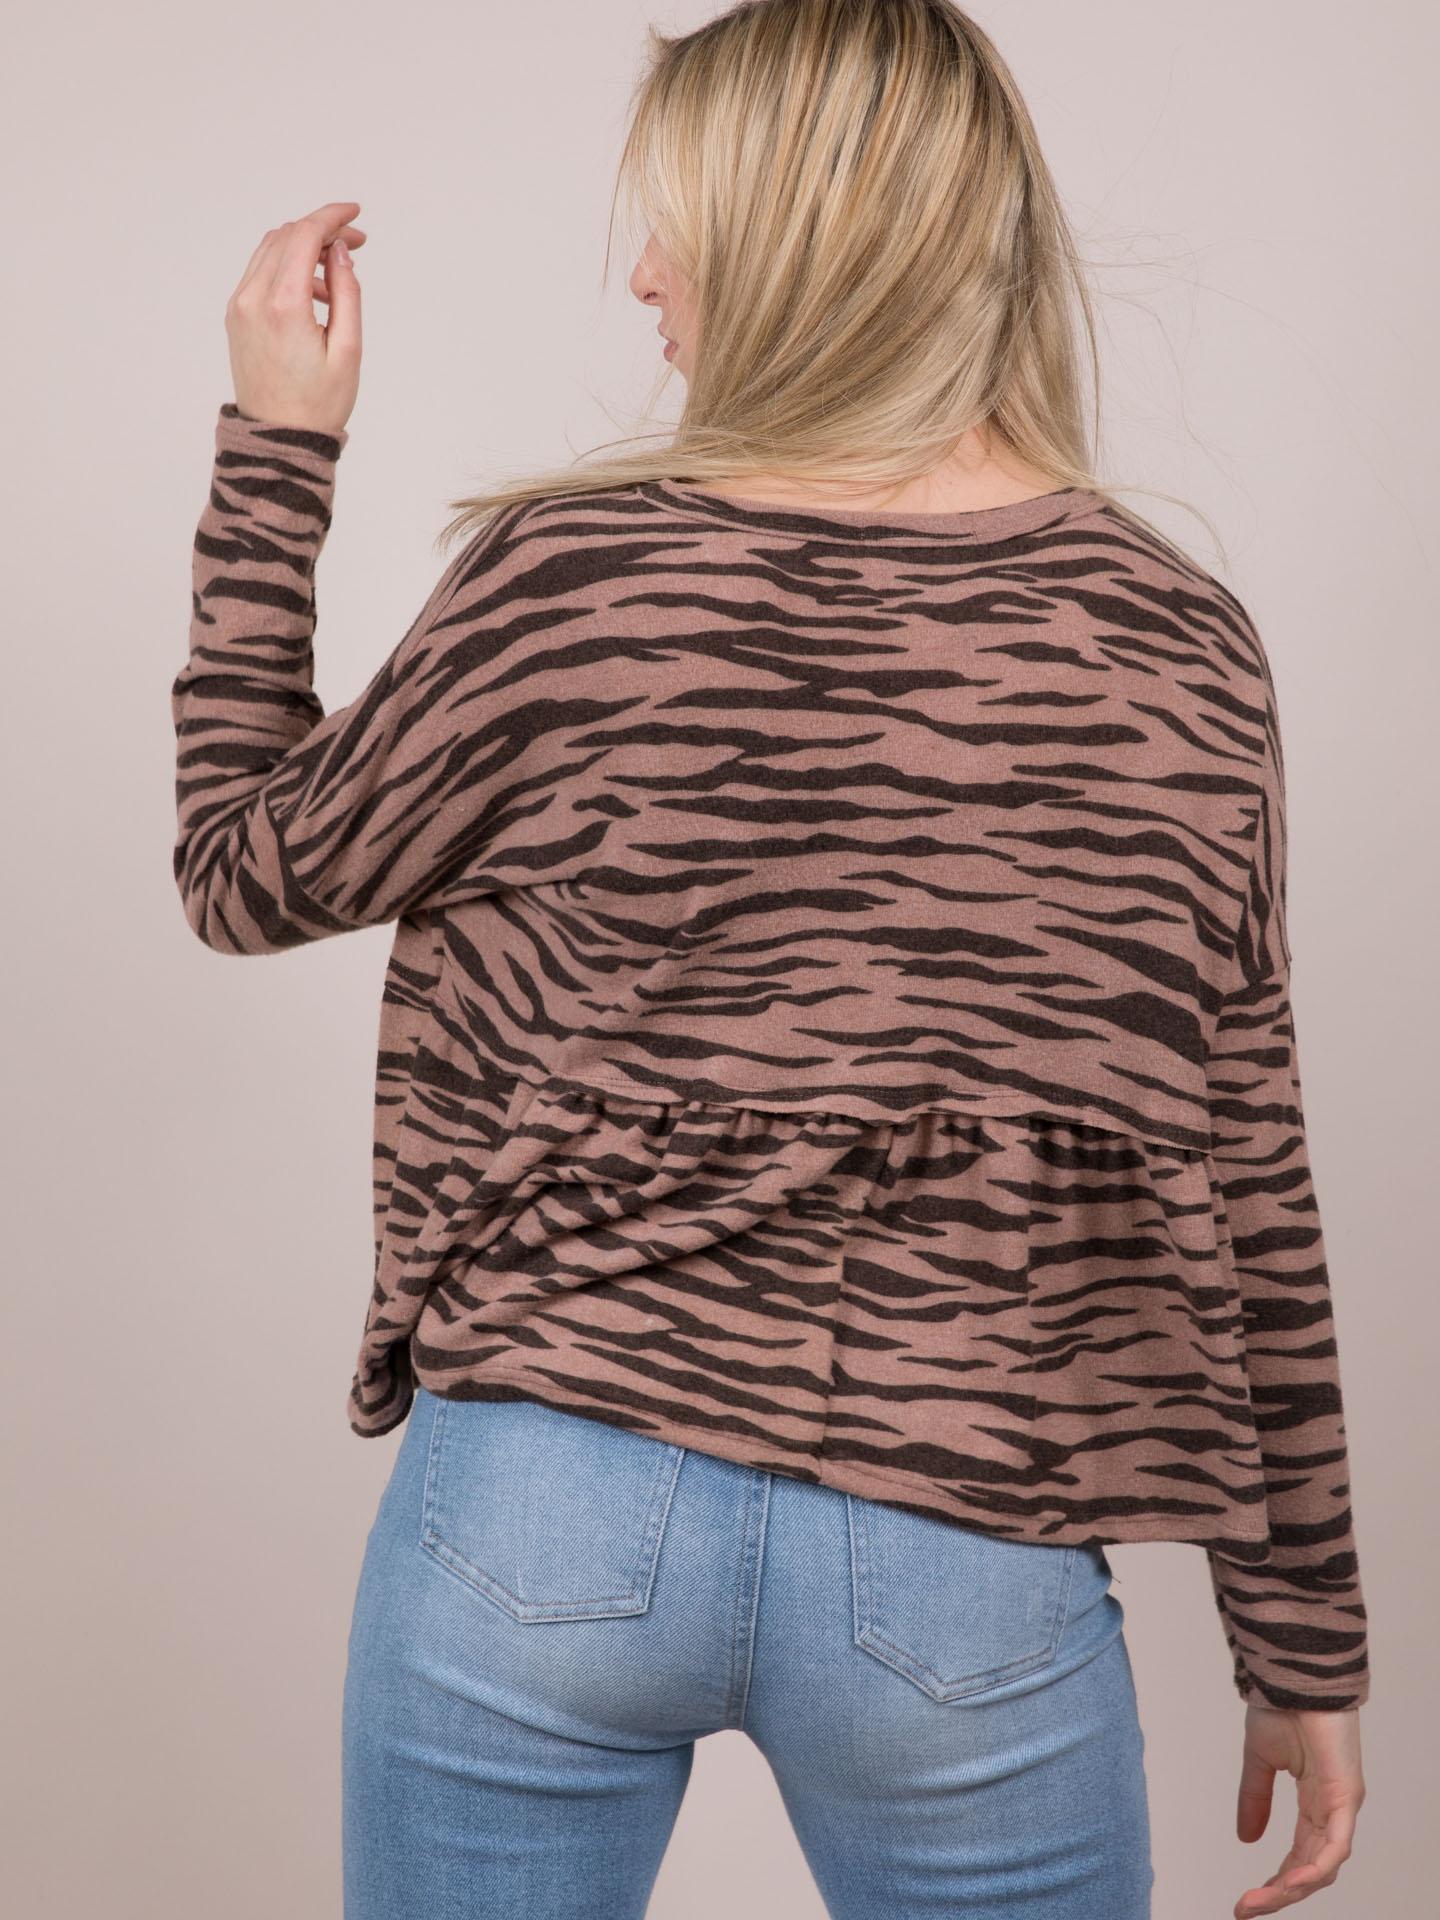 Tiger Soft Top  Peplum Patterned Long Sleeve Back